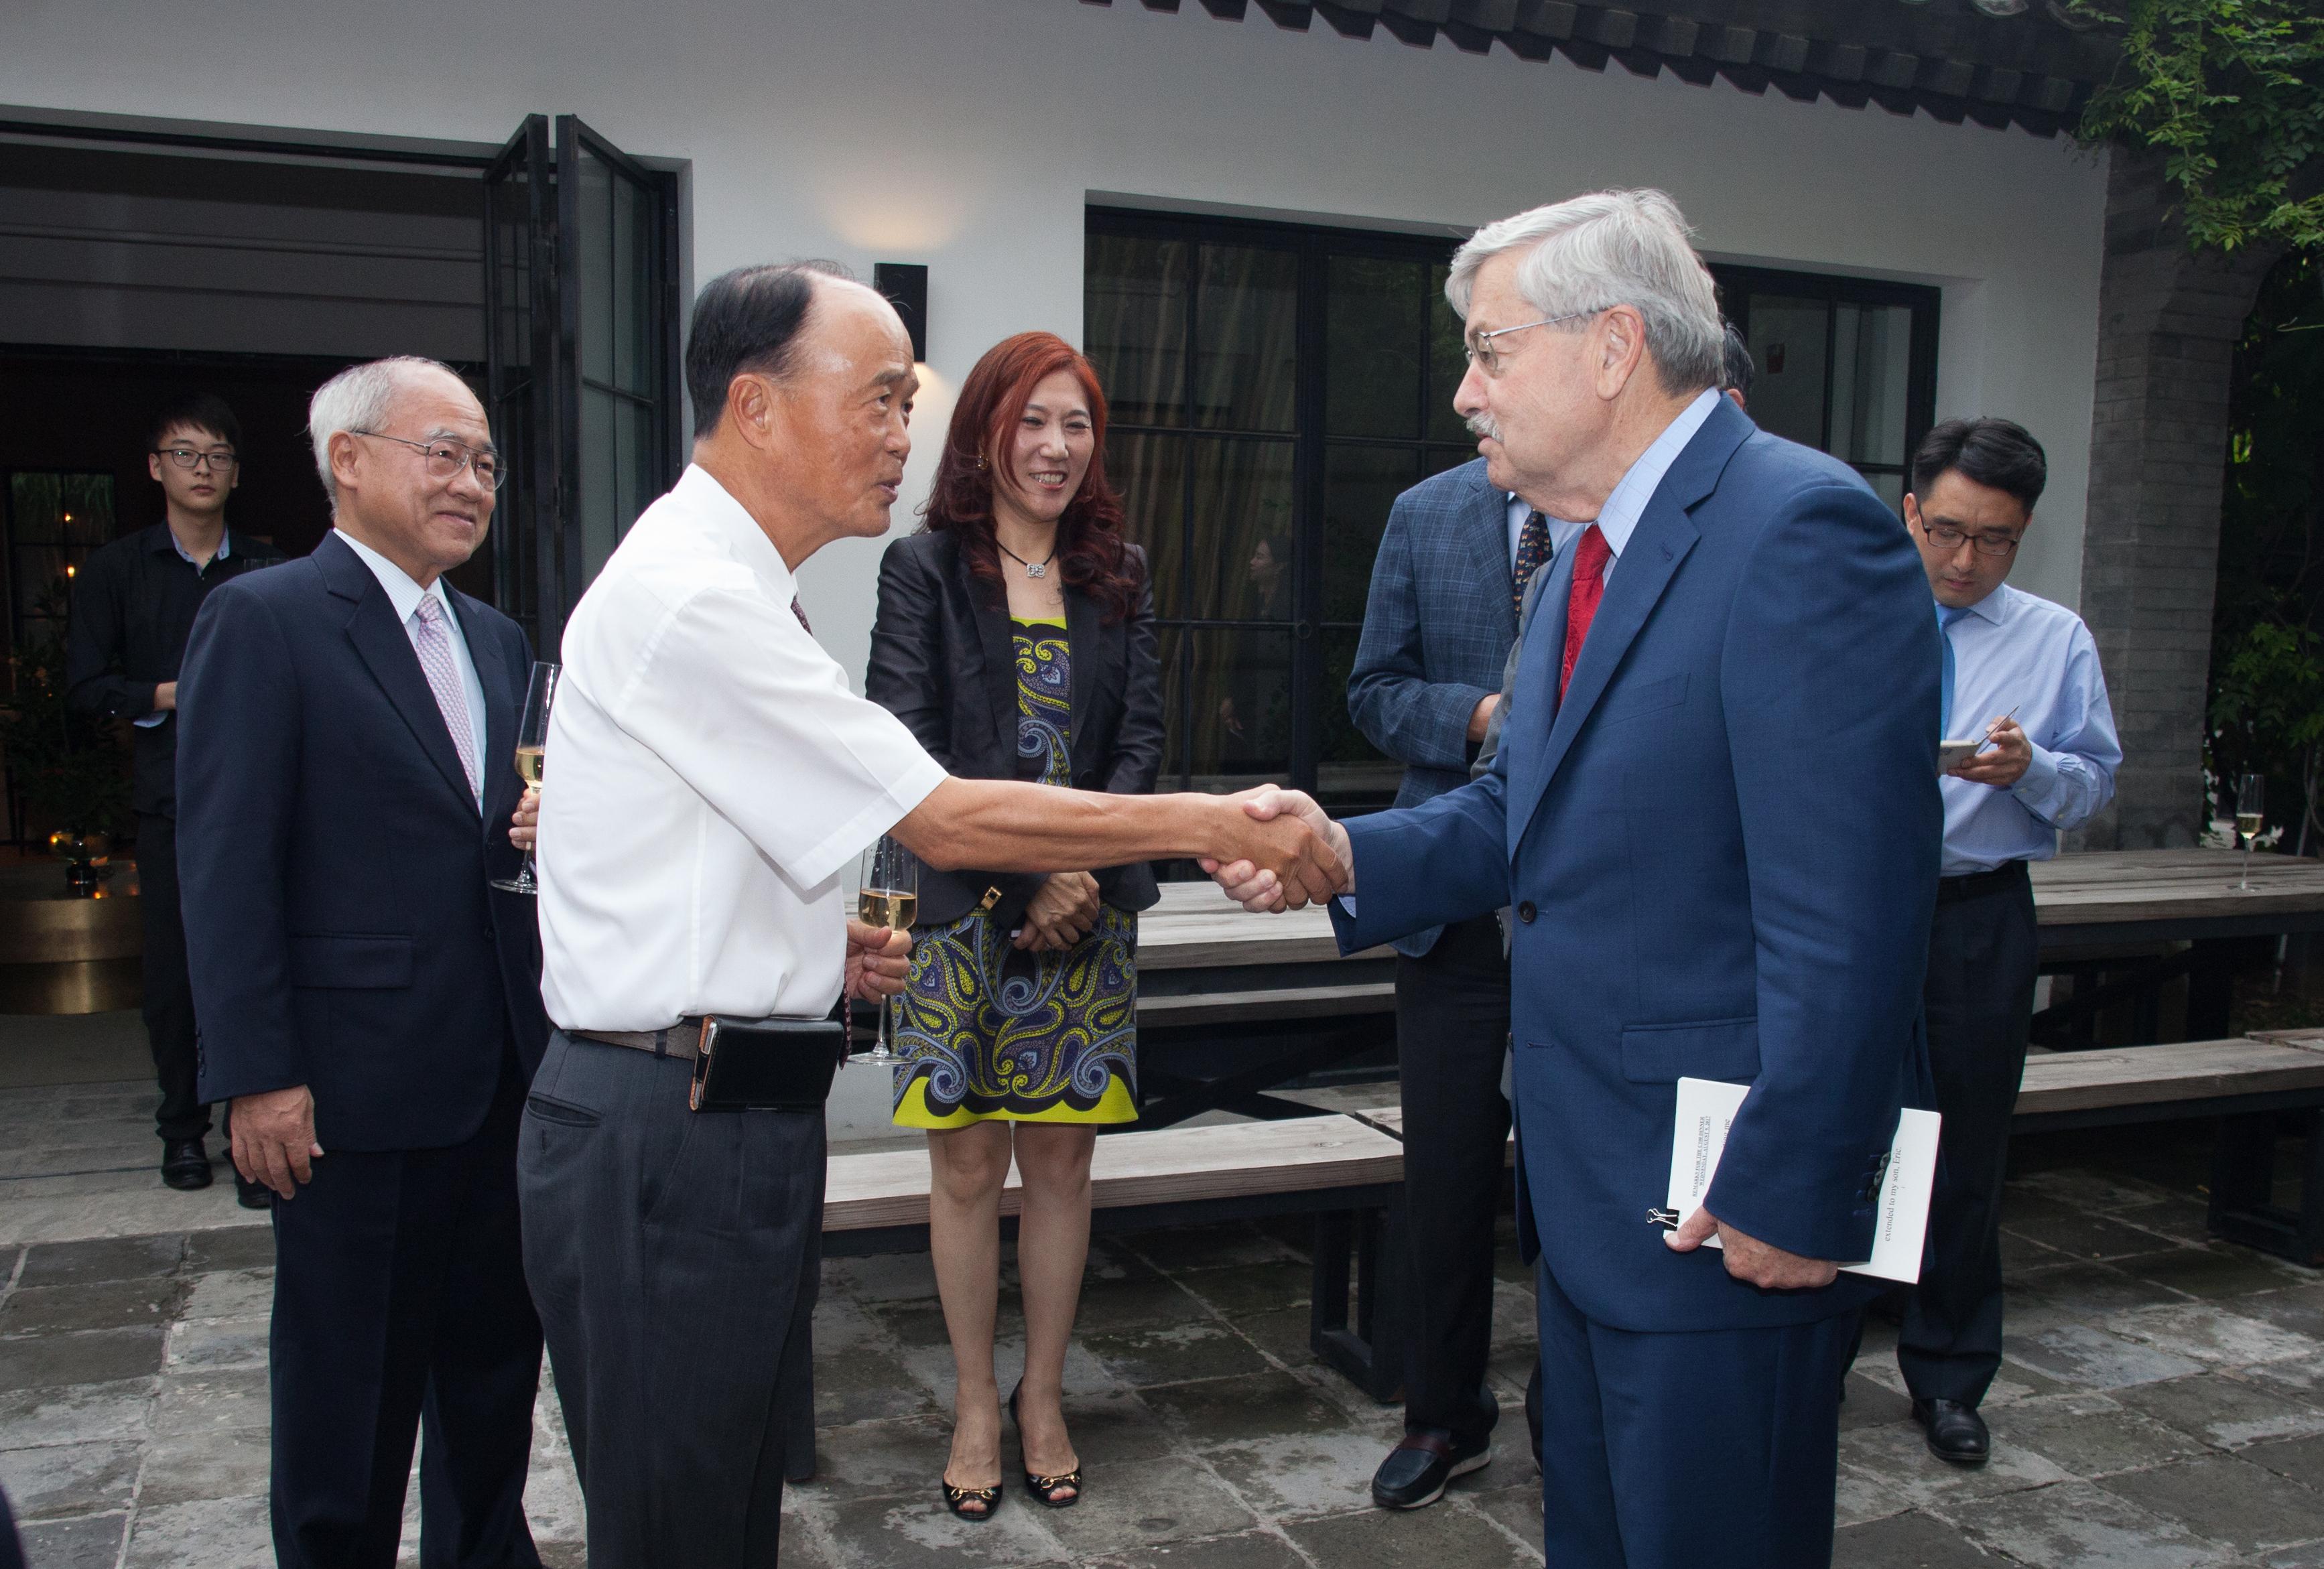 Carter Tseng and Ambassador Branstad shaking hands